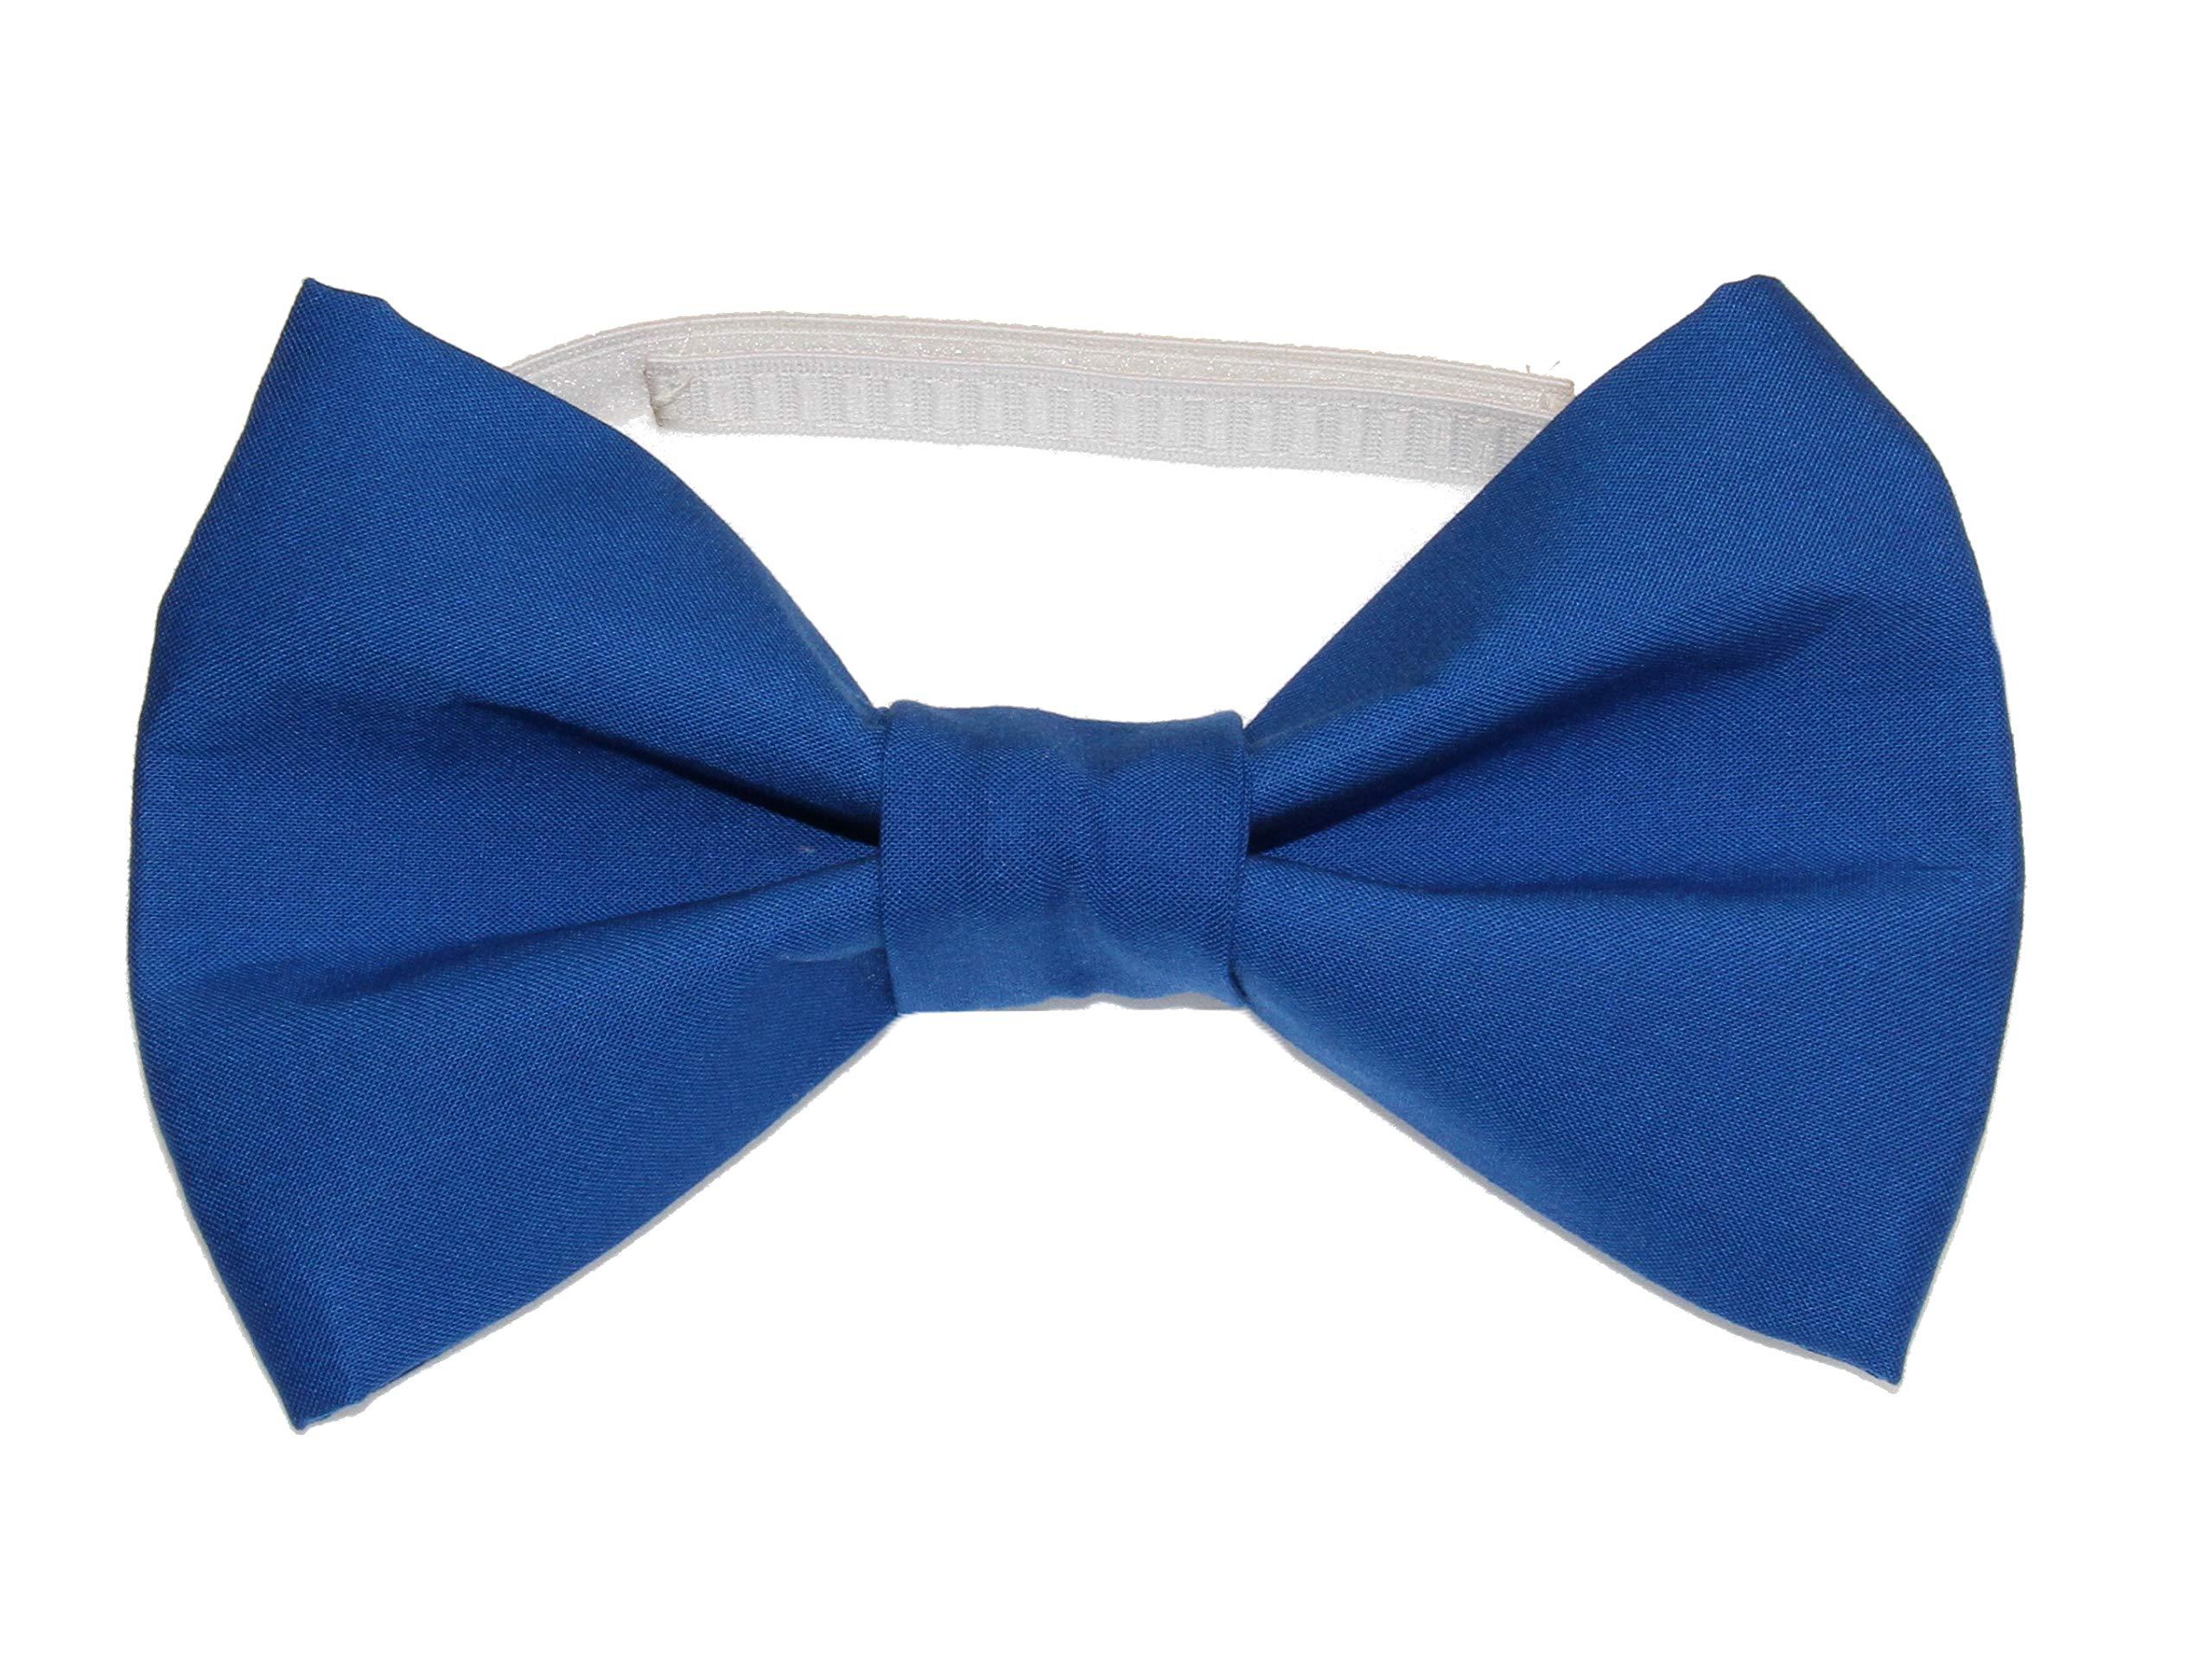 amy2004marie Royal Blue Clown Size XXL Cotton Bow Tie - Oversized Huge Bowtie 8'' x 5''